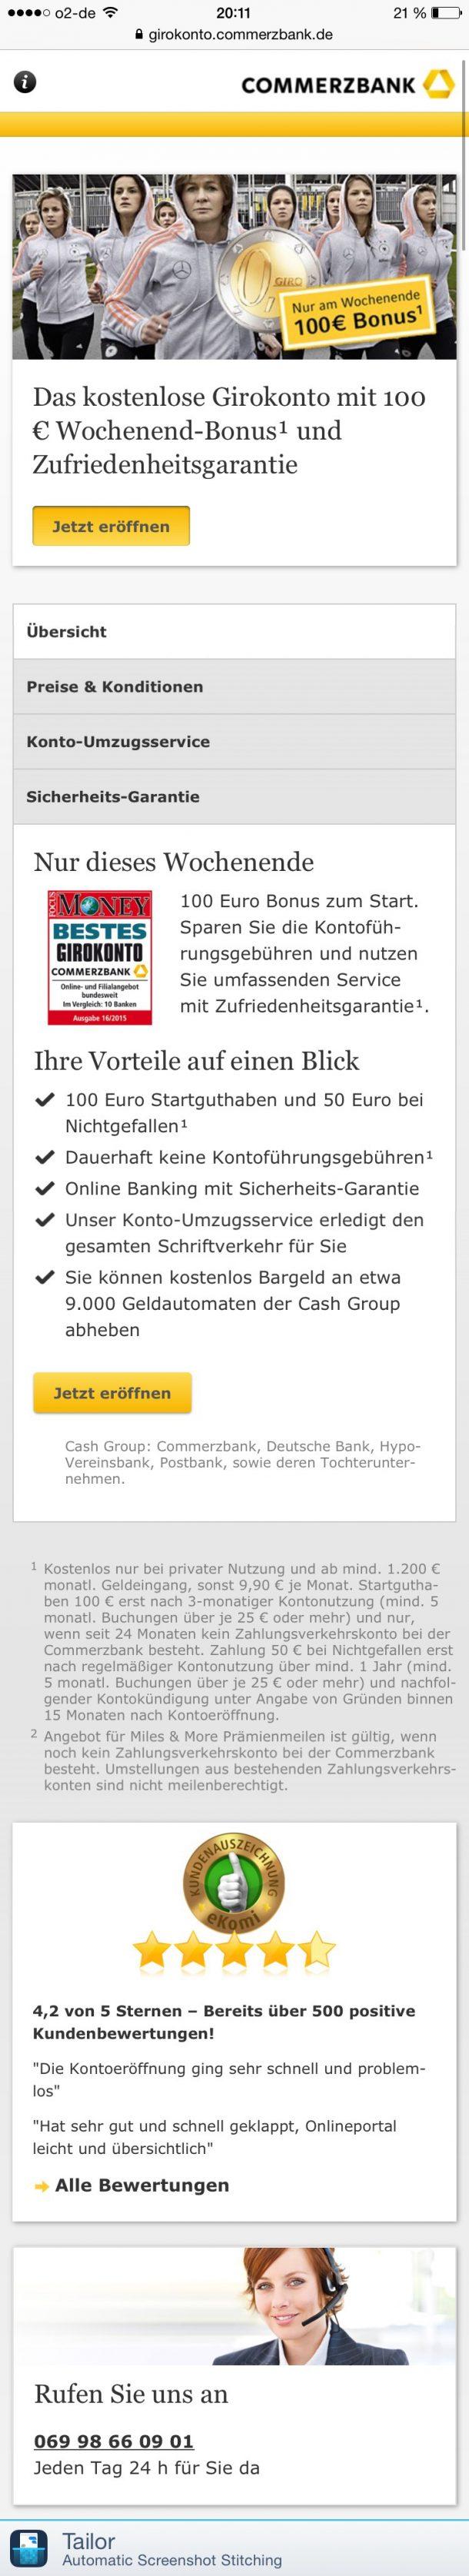 Vertrauen positiv Commerzbank